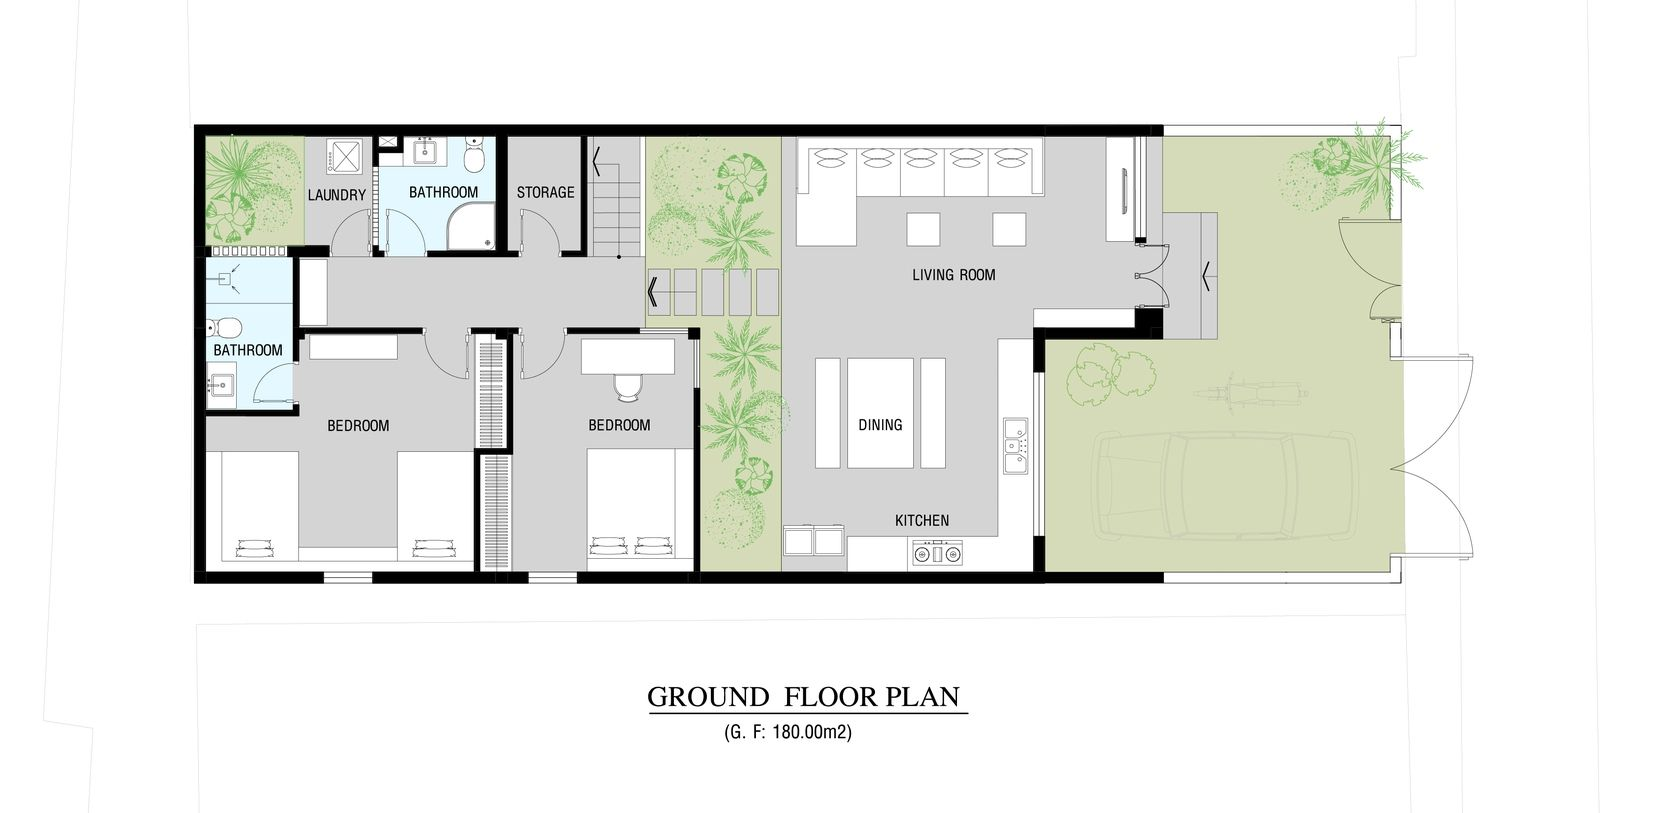 Go Vap House - Saigon, Vietnam Small urban house for a family of ...